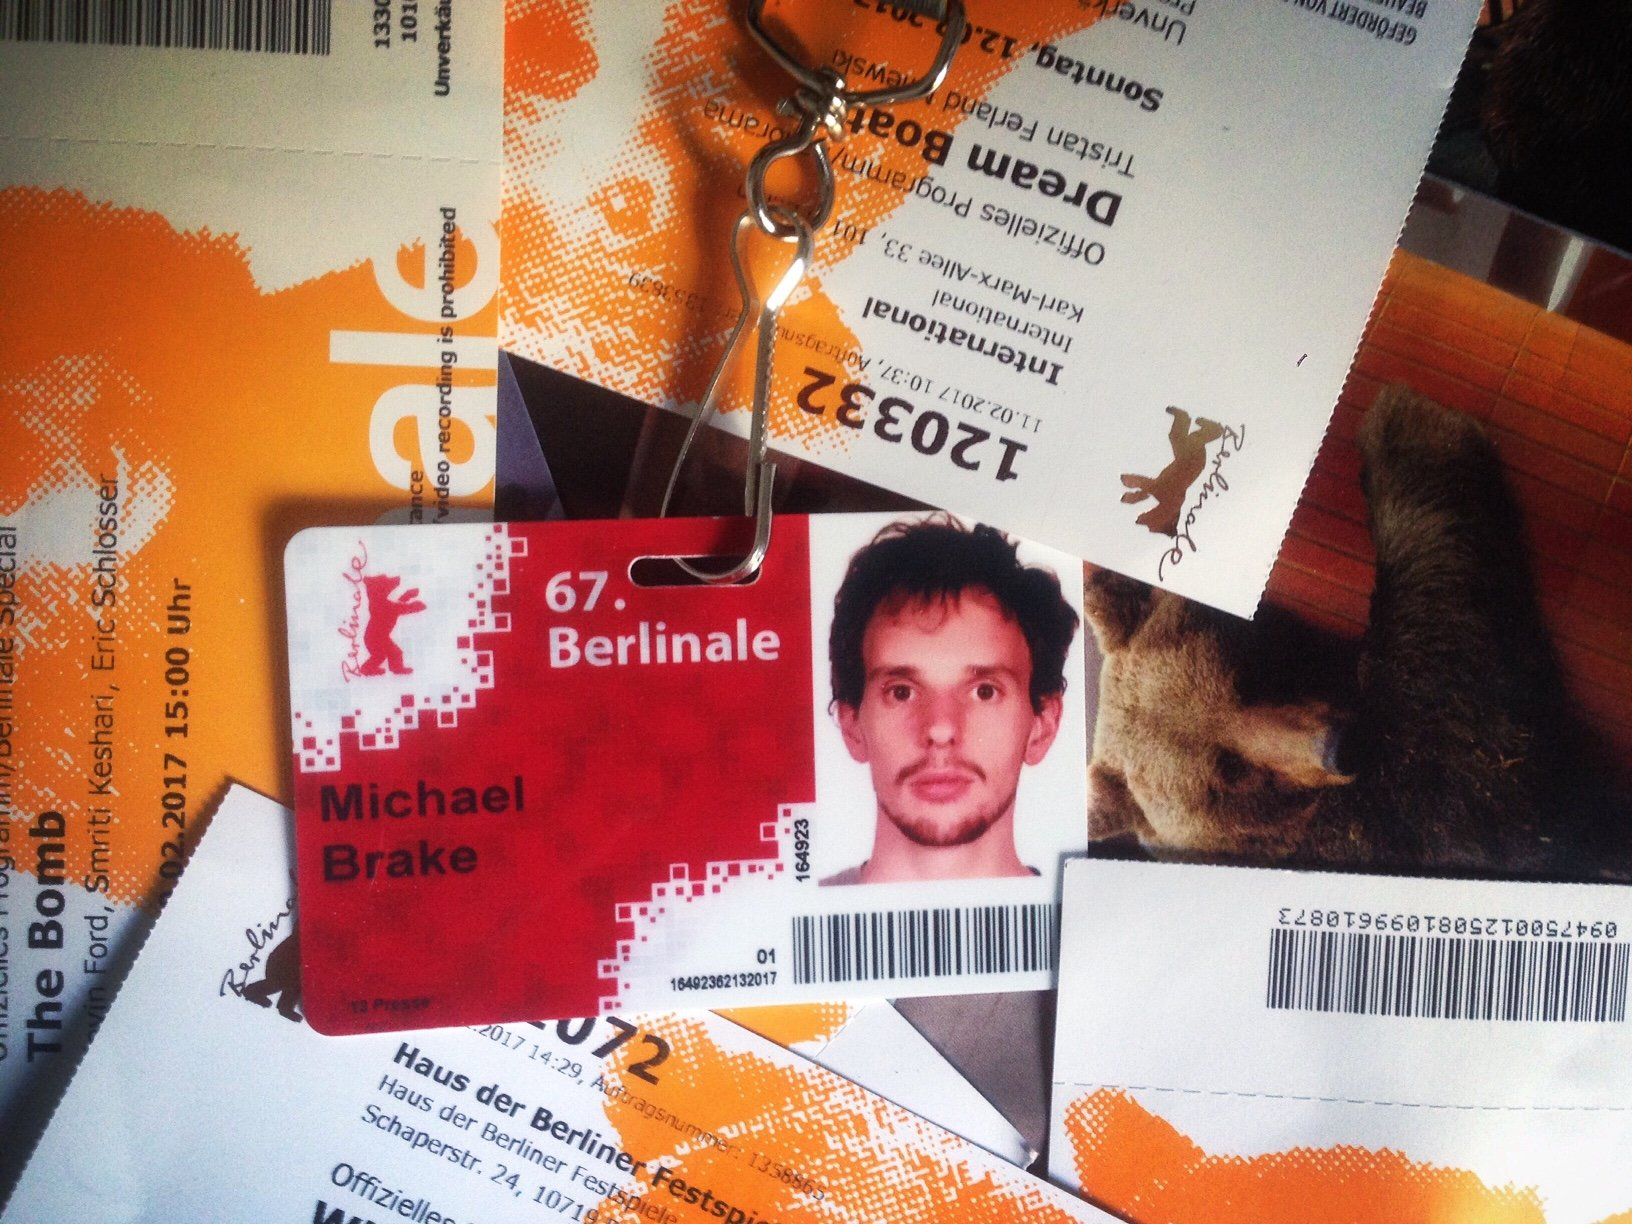 Berlinale-Blogger Michael Brake